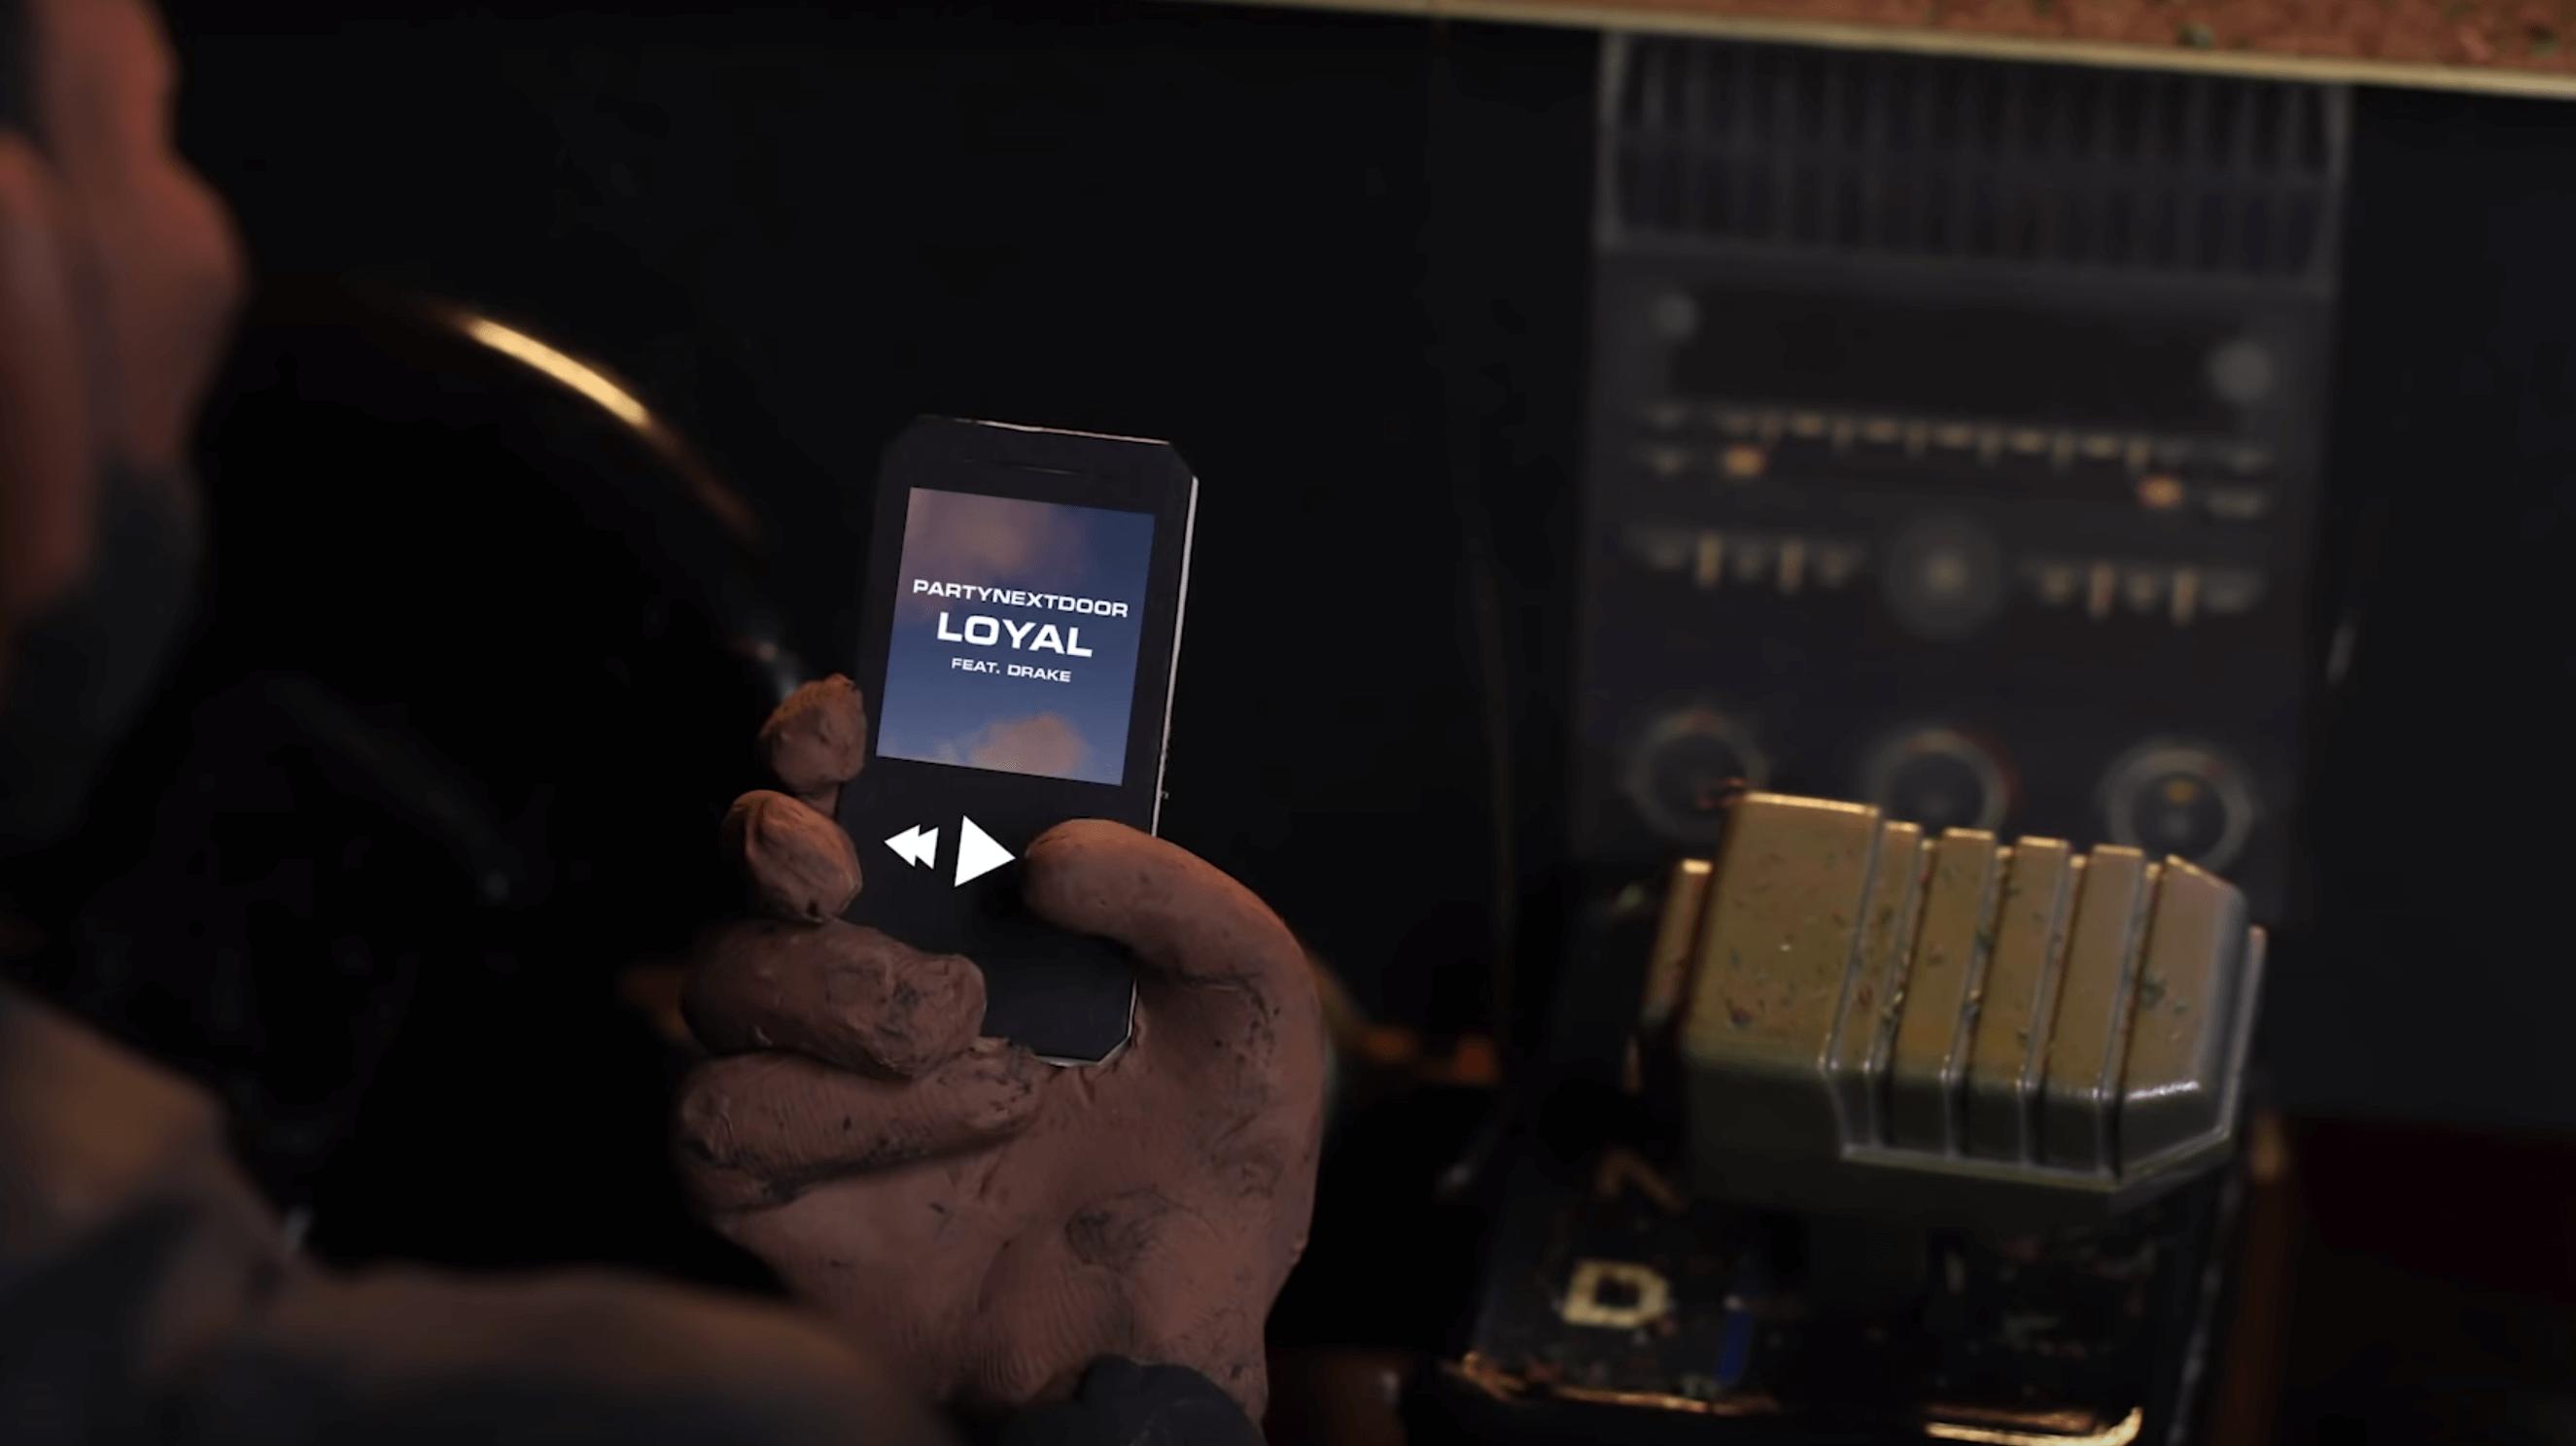 PARTYNEXTDOOR - Loyal feat. Drake